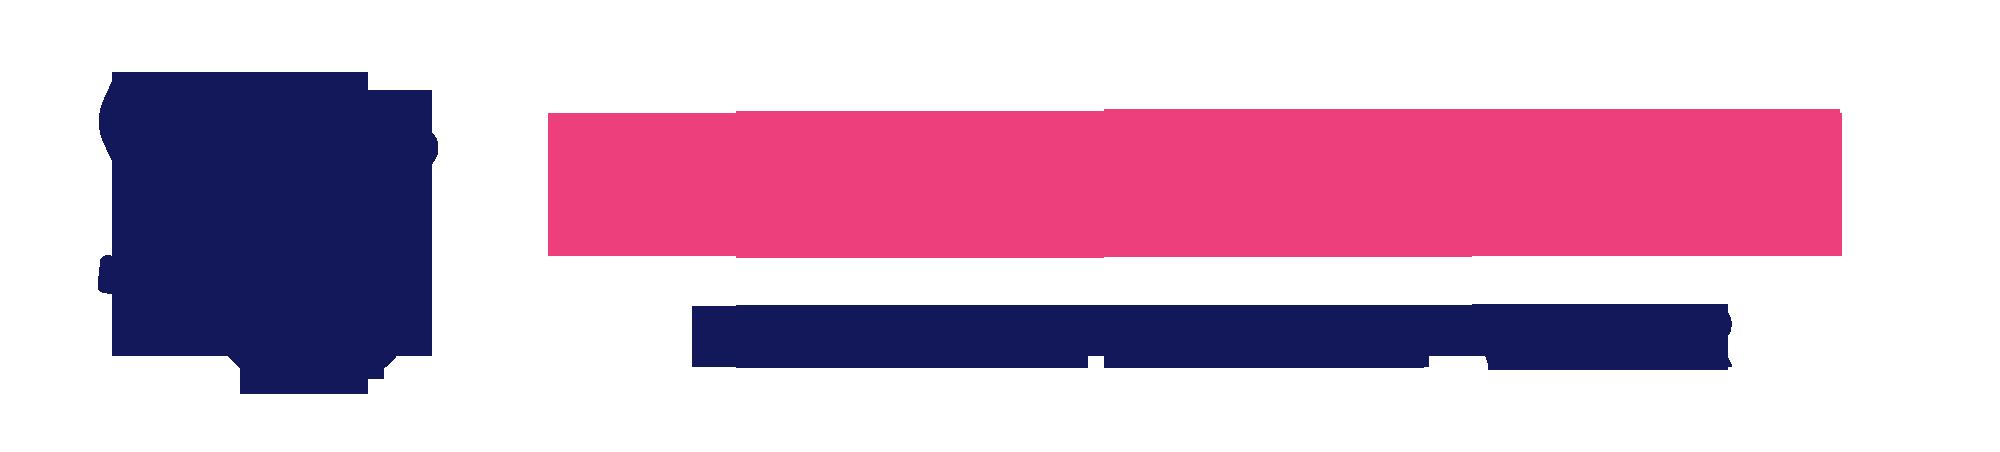 logo heycaptain